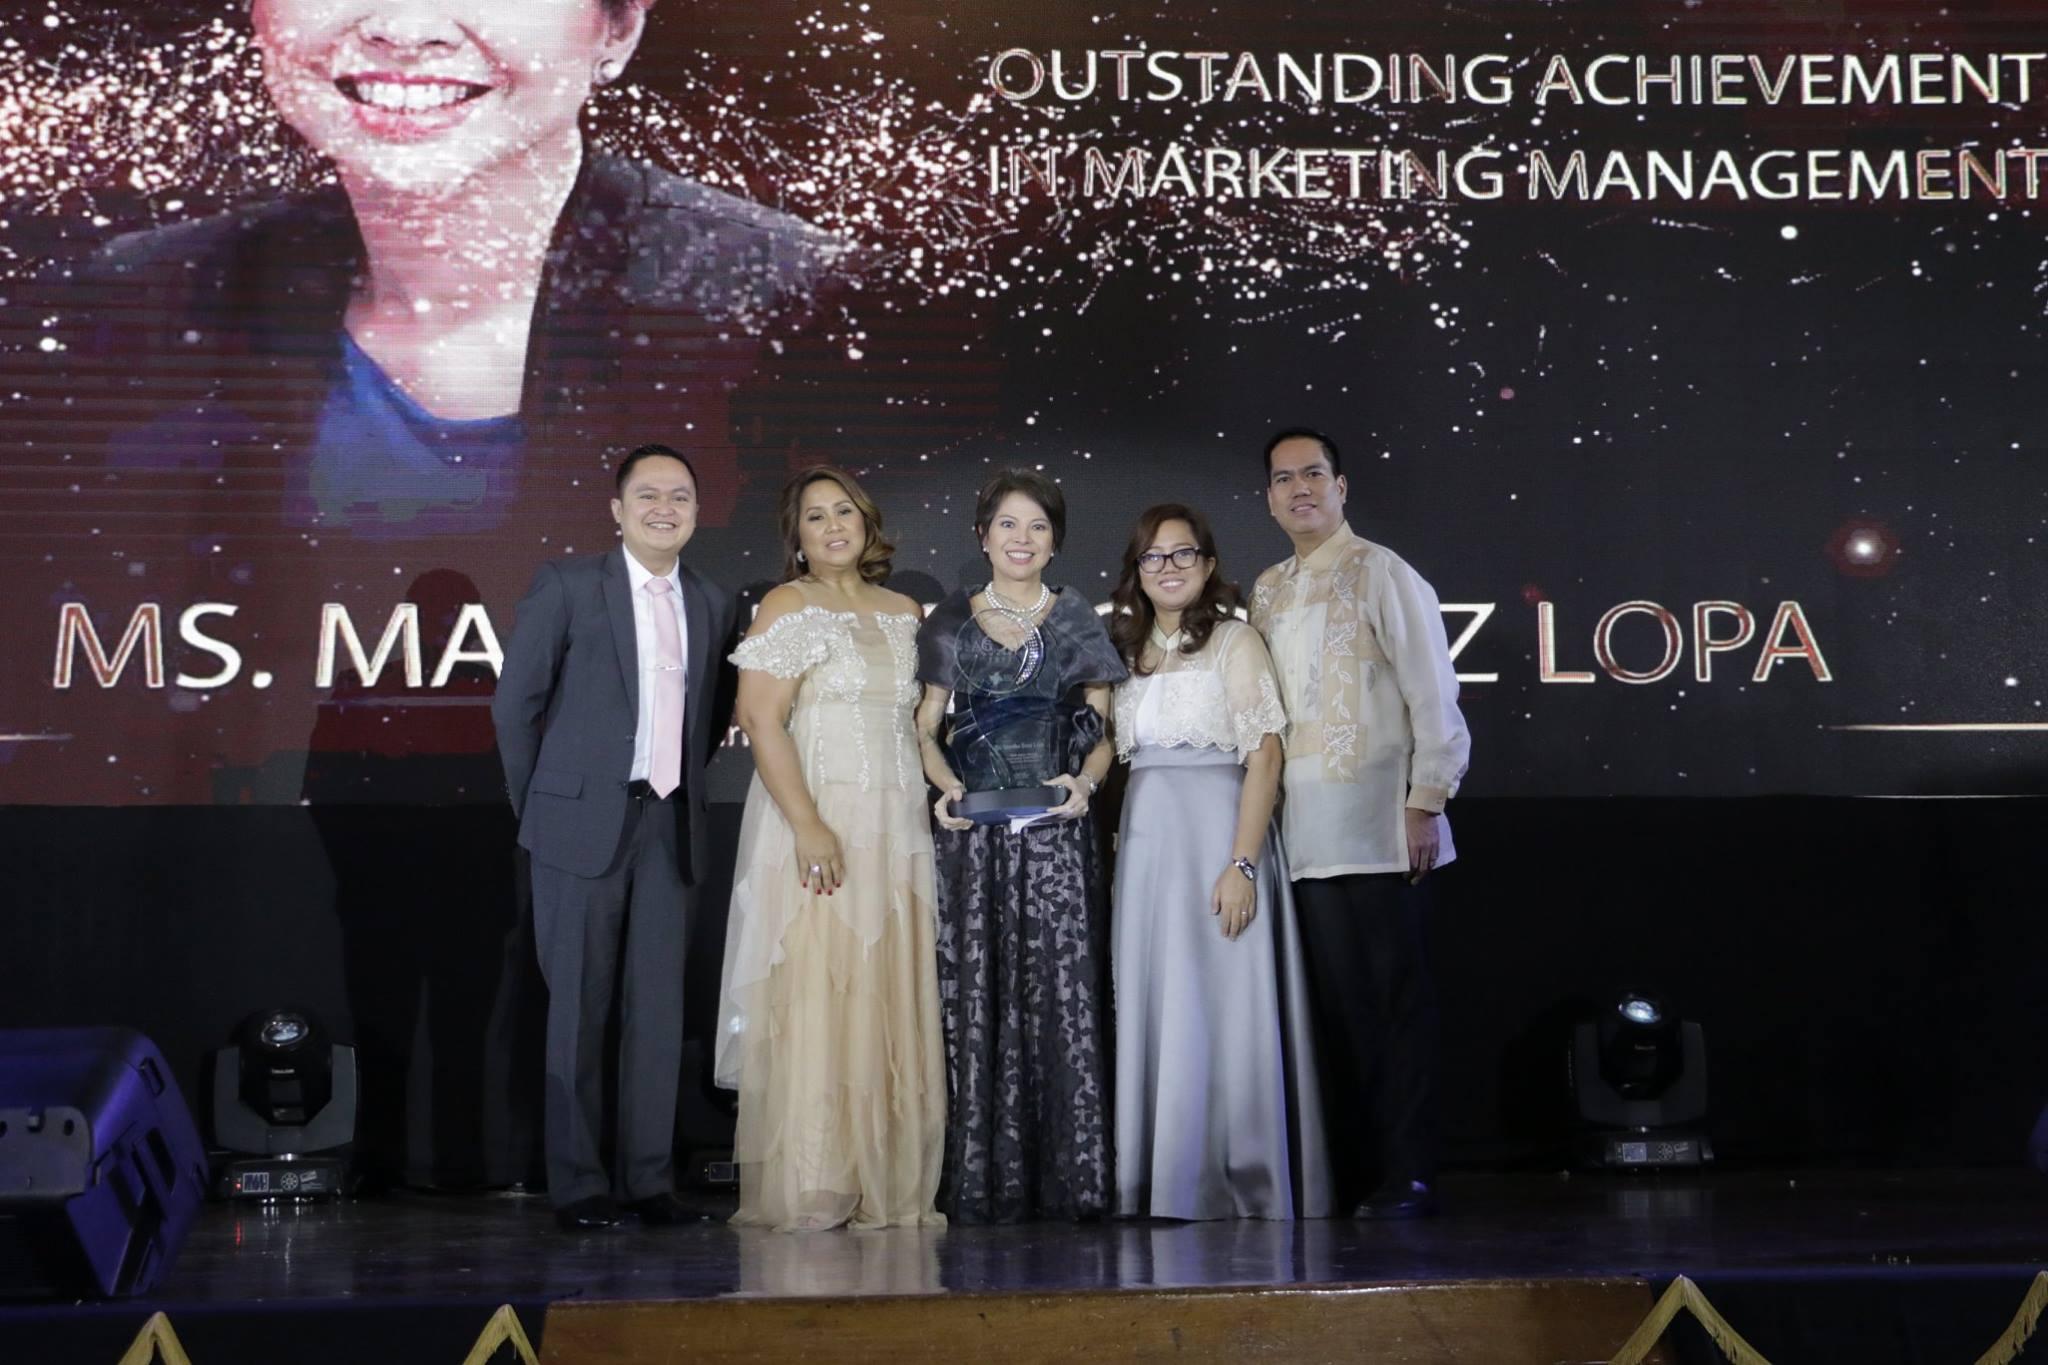 Outstanding Achievement in Marketing Management Winner, Ms Mylene Lopa, Marketing Director of Sunlife Financial Philippines